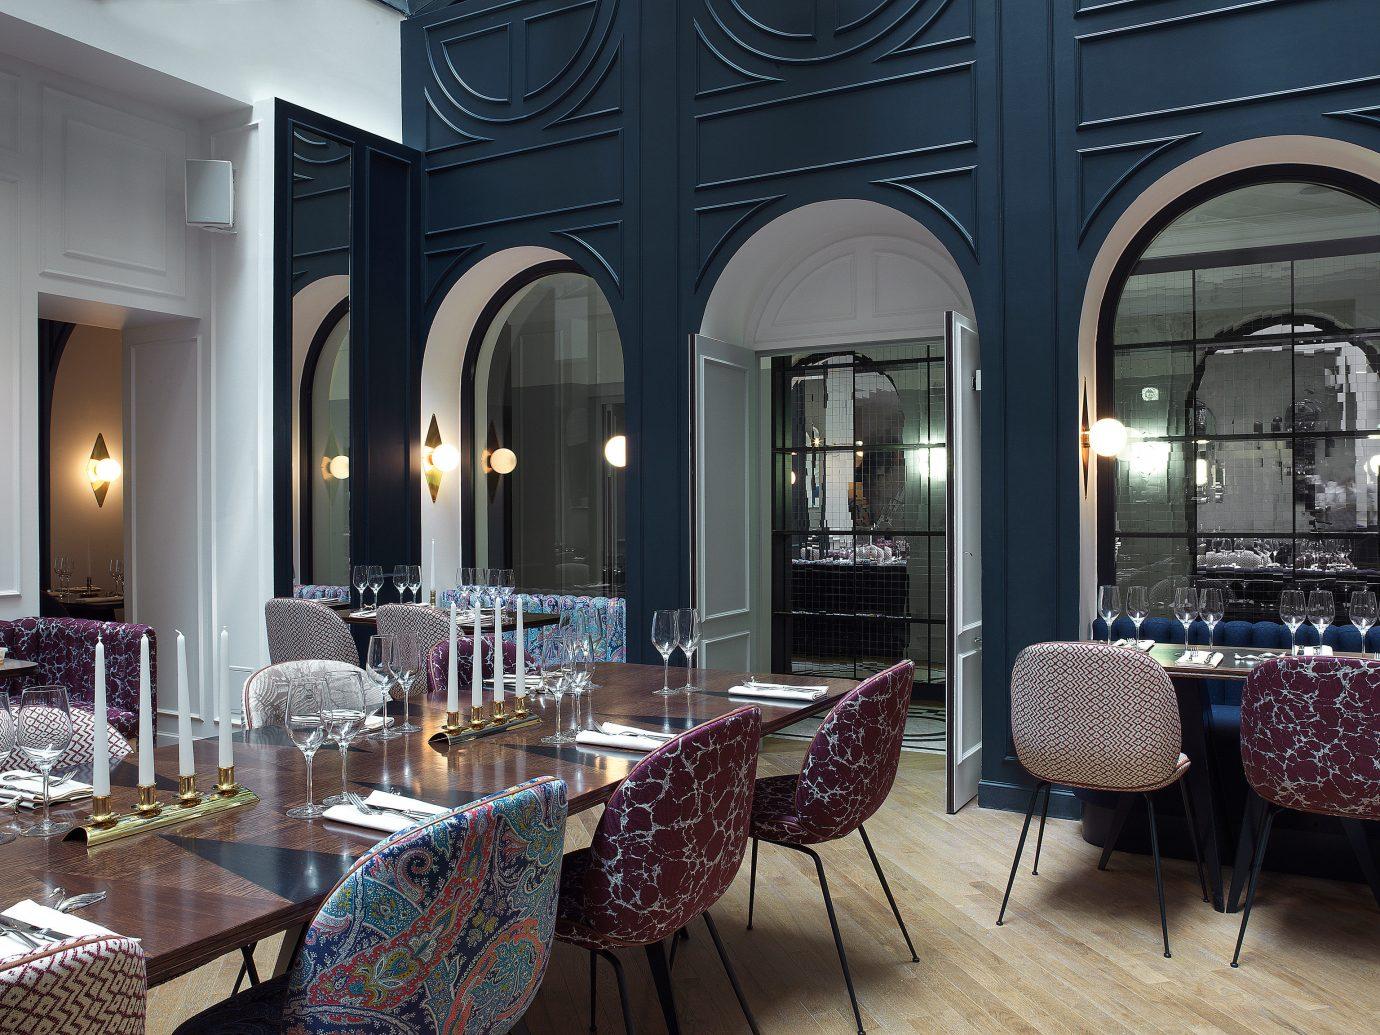 Boutique Hotels Hotels floor indoor chair room Lobby restaurant estate interior design dining room Design meal living room area furniture several